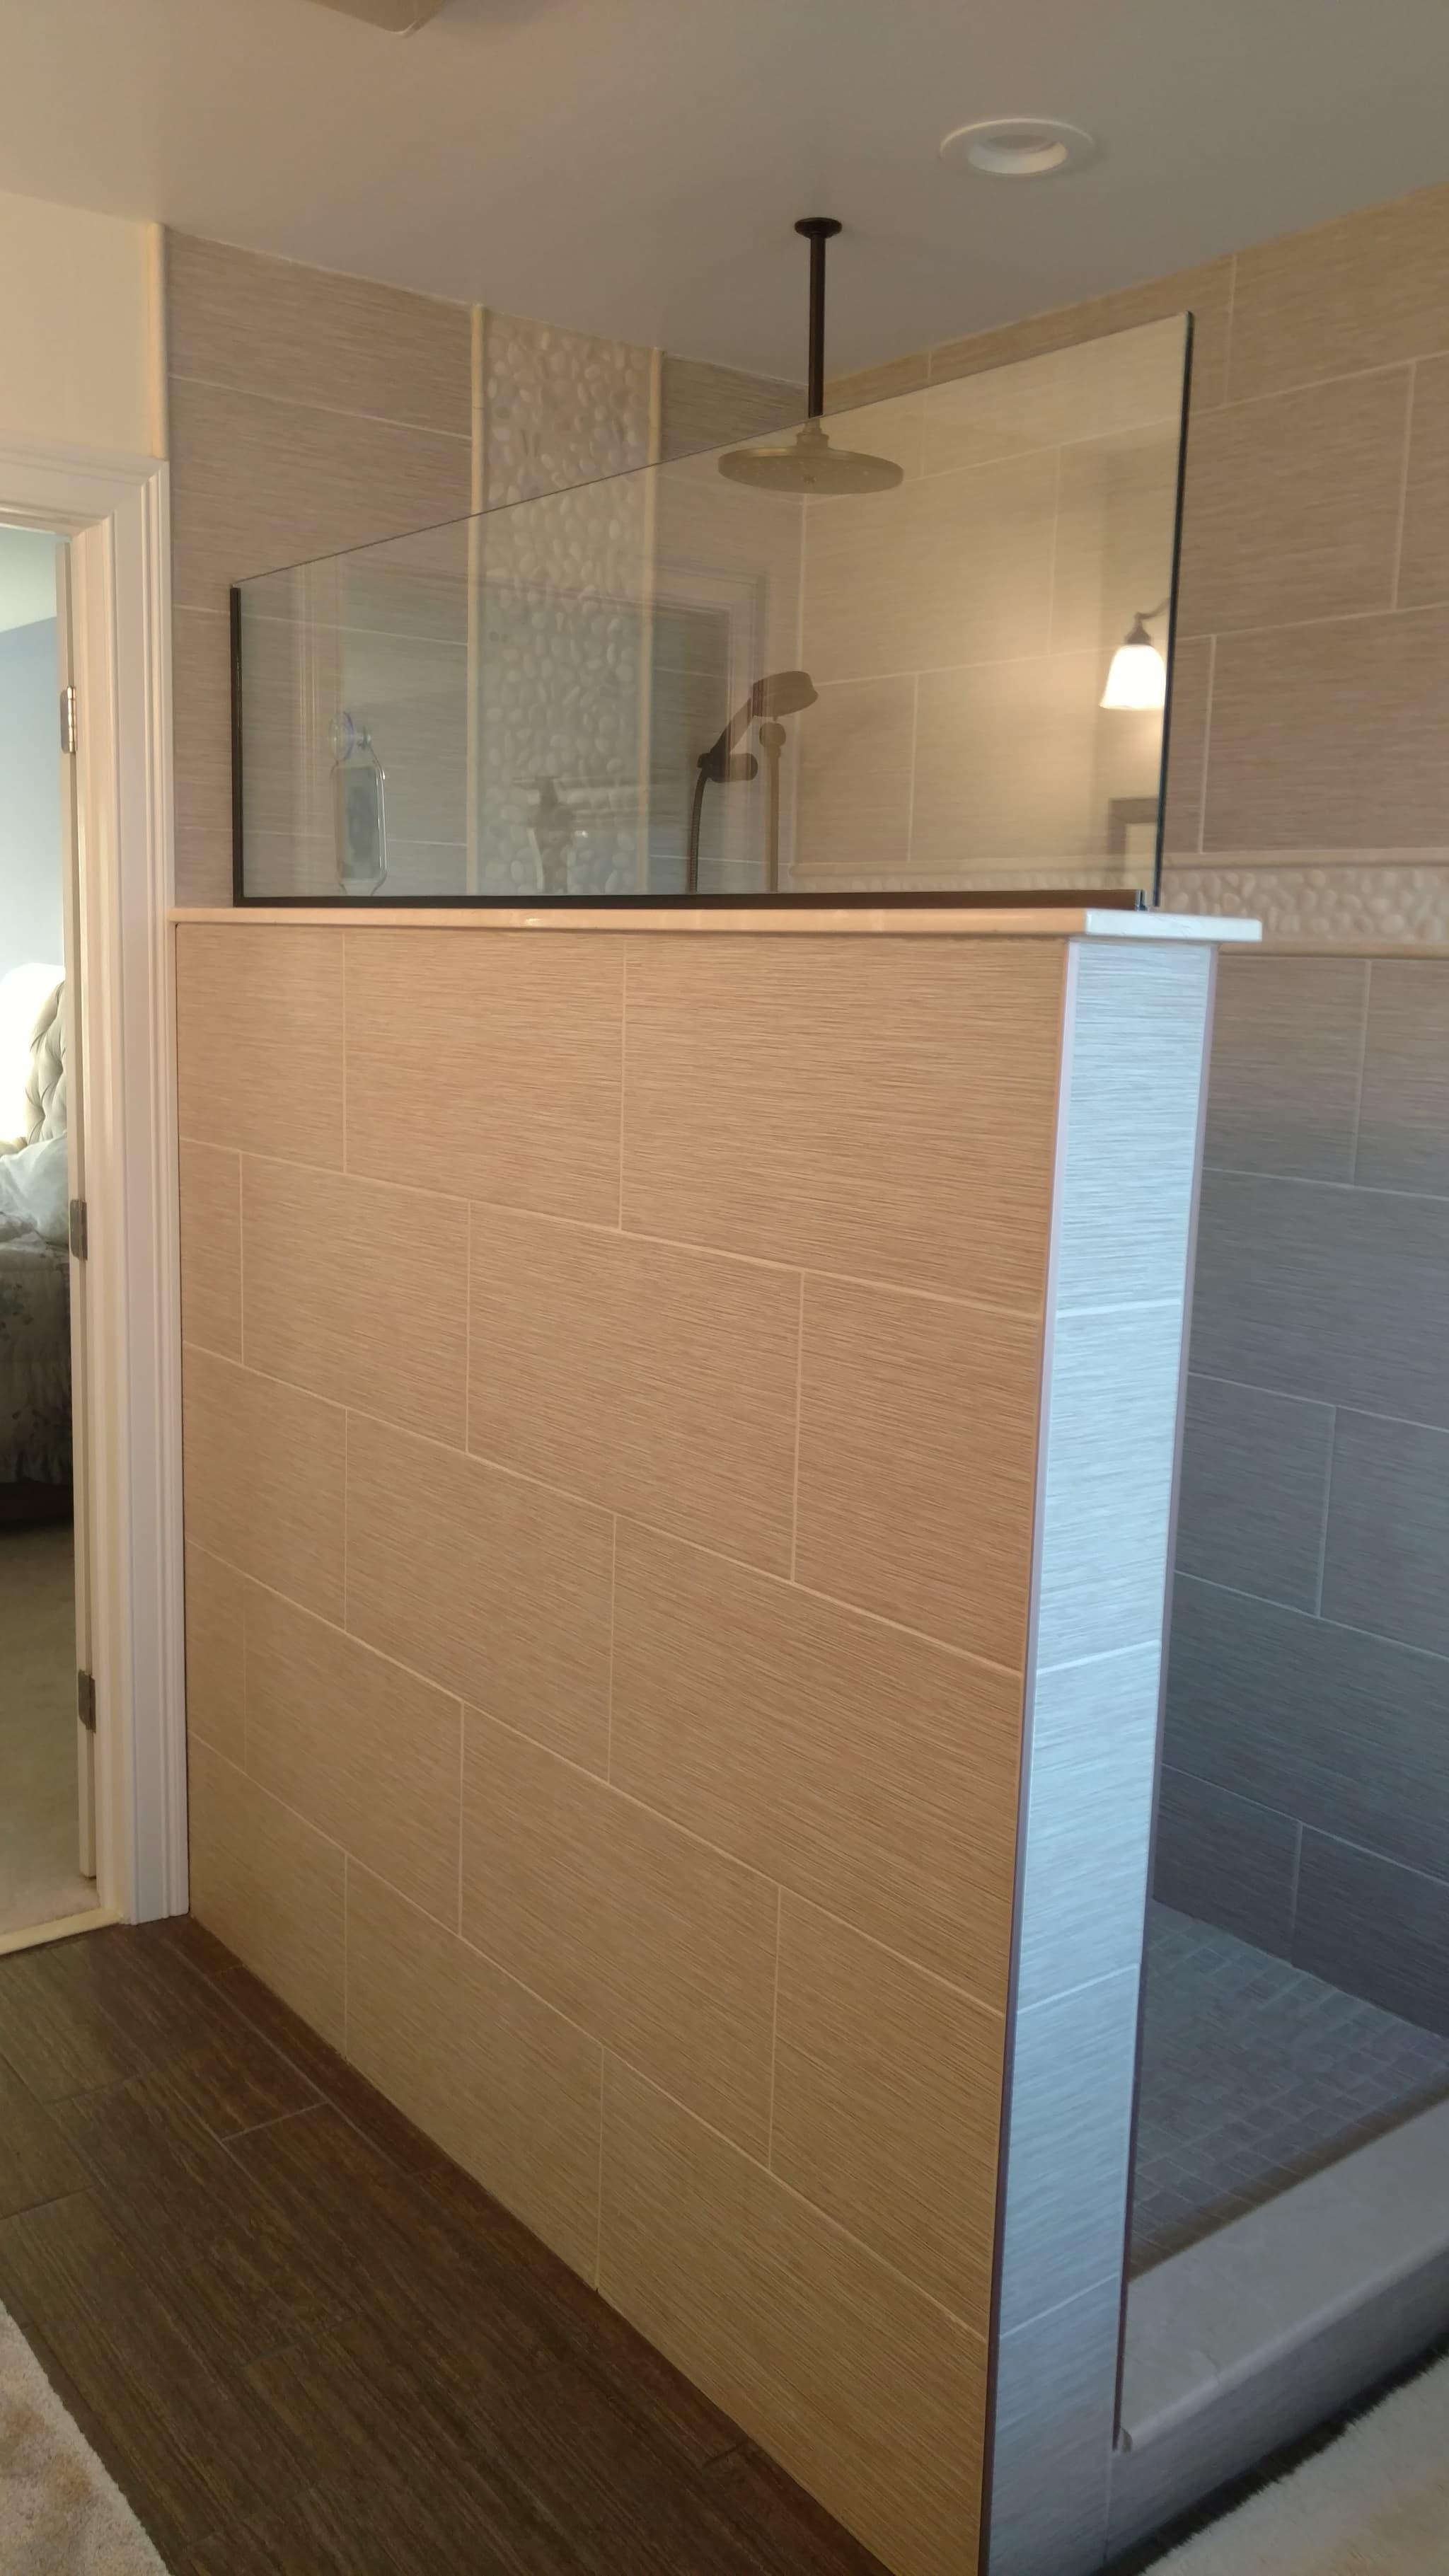 High End Bathroom Remodeling Fairfield County CT  Alan DCS